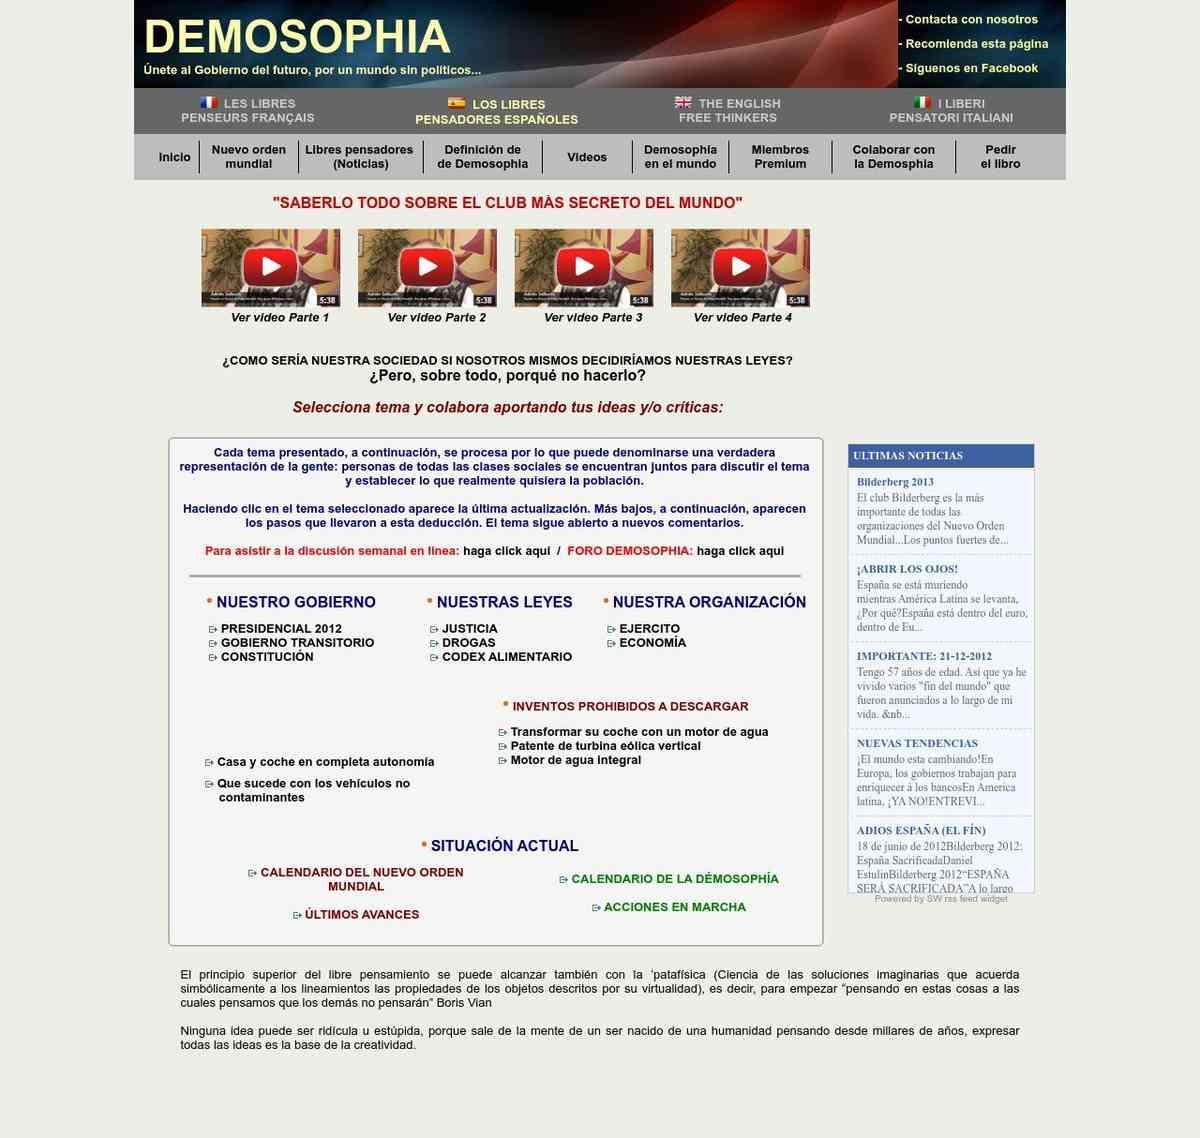 DEMOSOPHY - FREE THINKERS | DEMOSOPHIE - LIBRES PENSEURS | DEMOSOPHIA - LIBRES PENSADORES